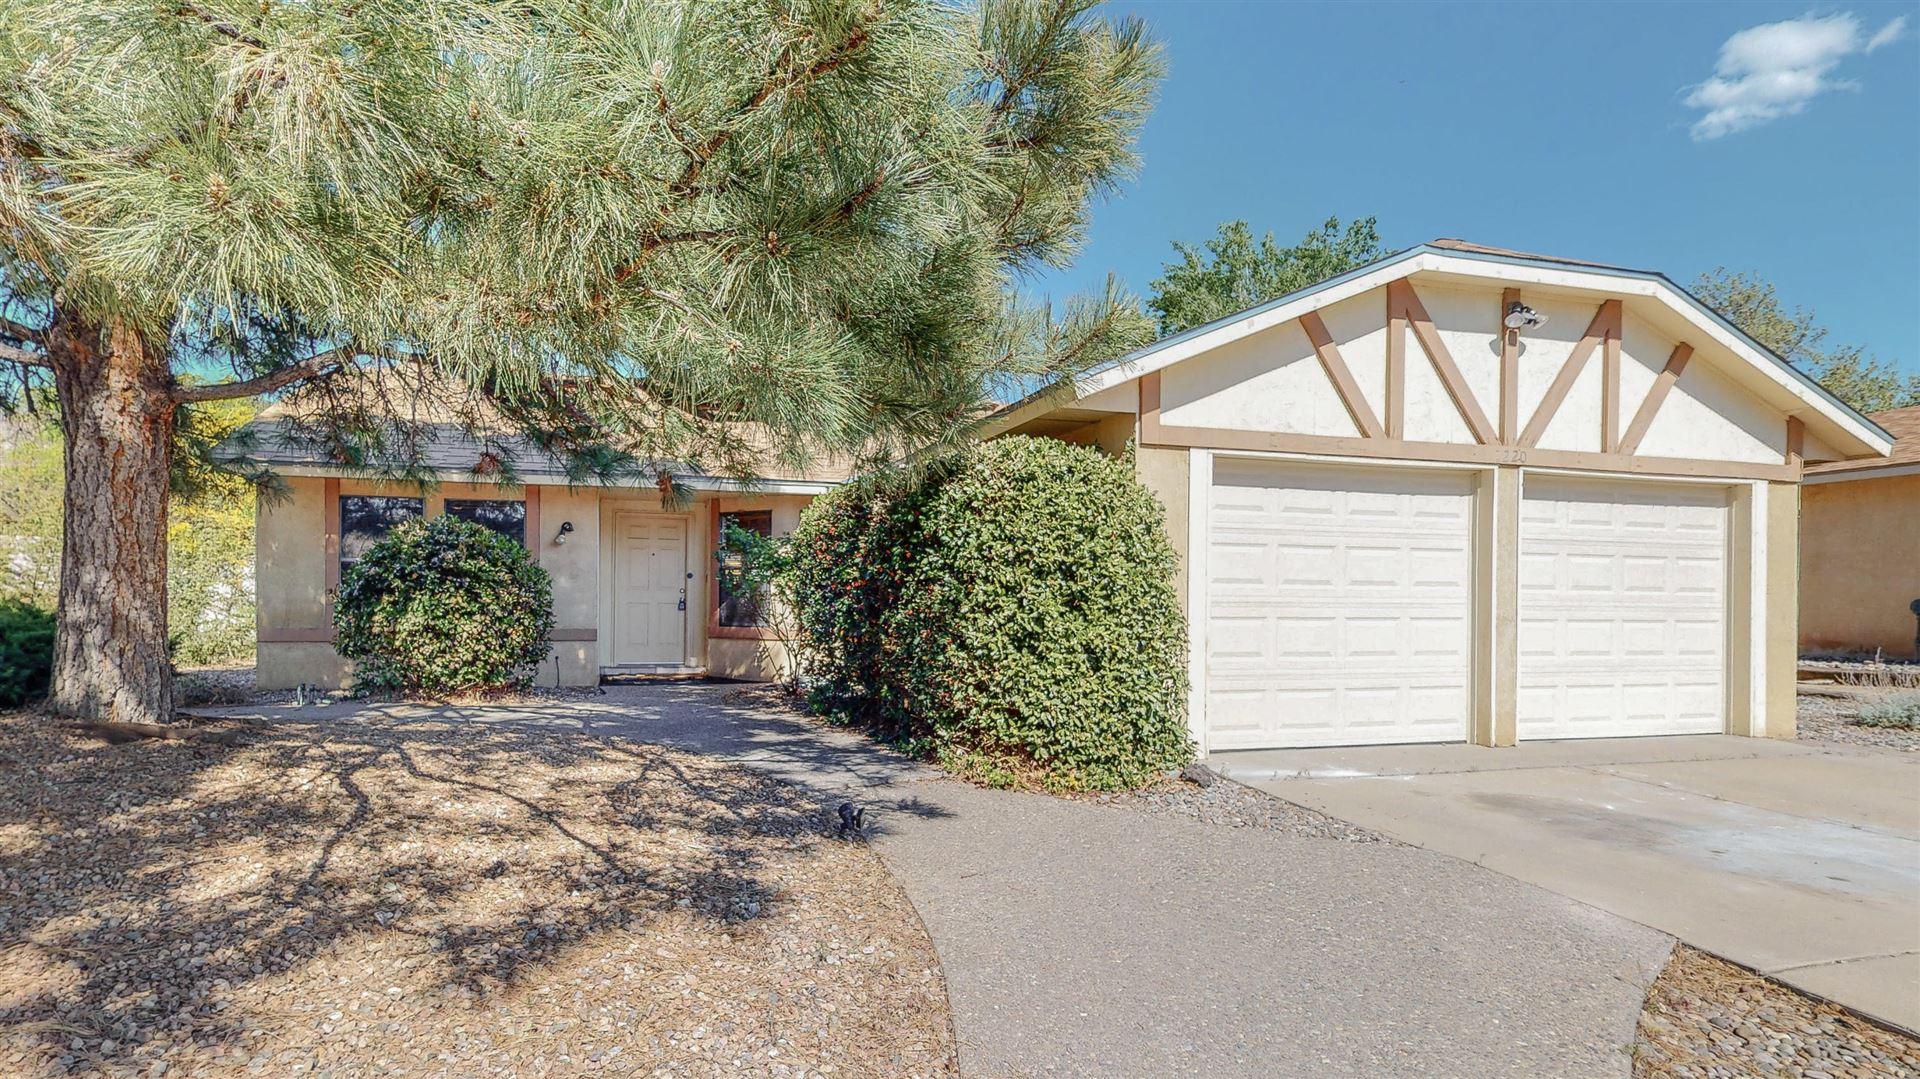 5220 OVERLOOK Drive NE, Albuquerque, NM 87111 - #: 991060